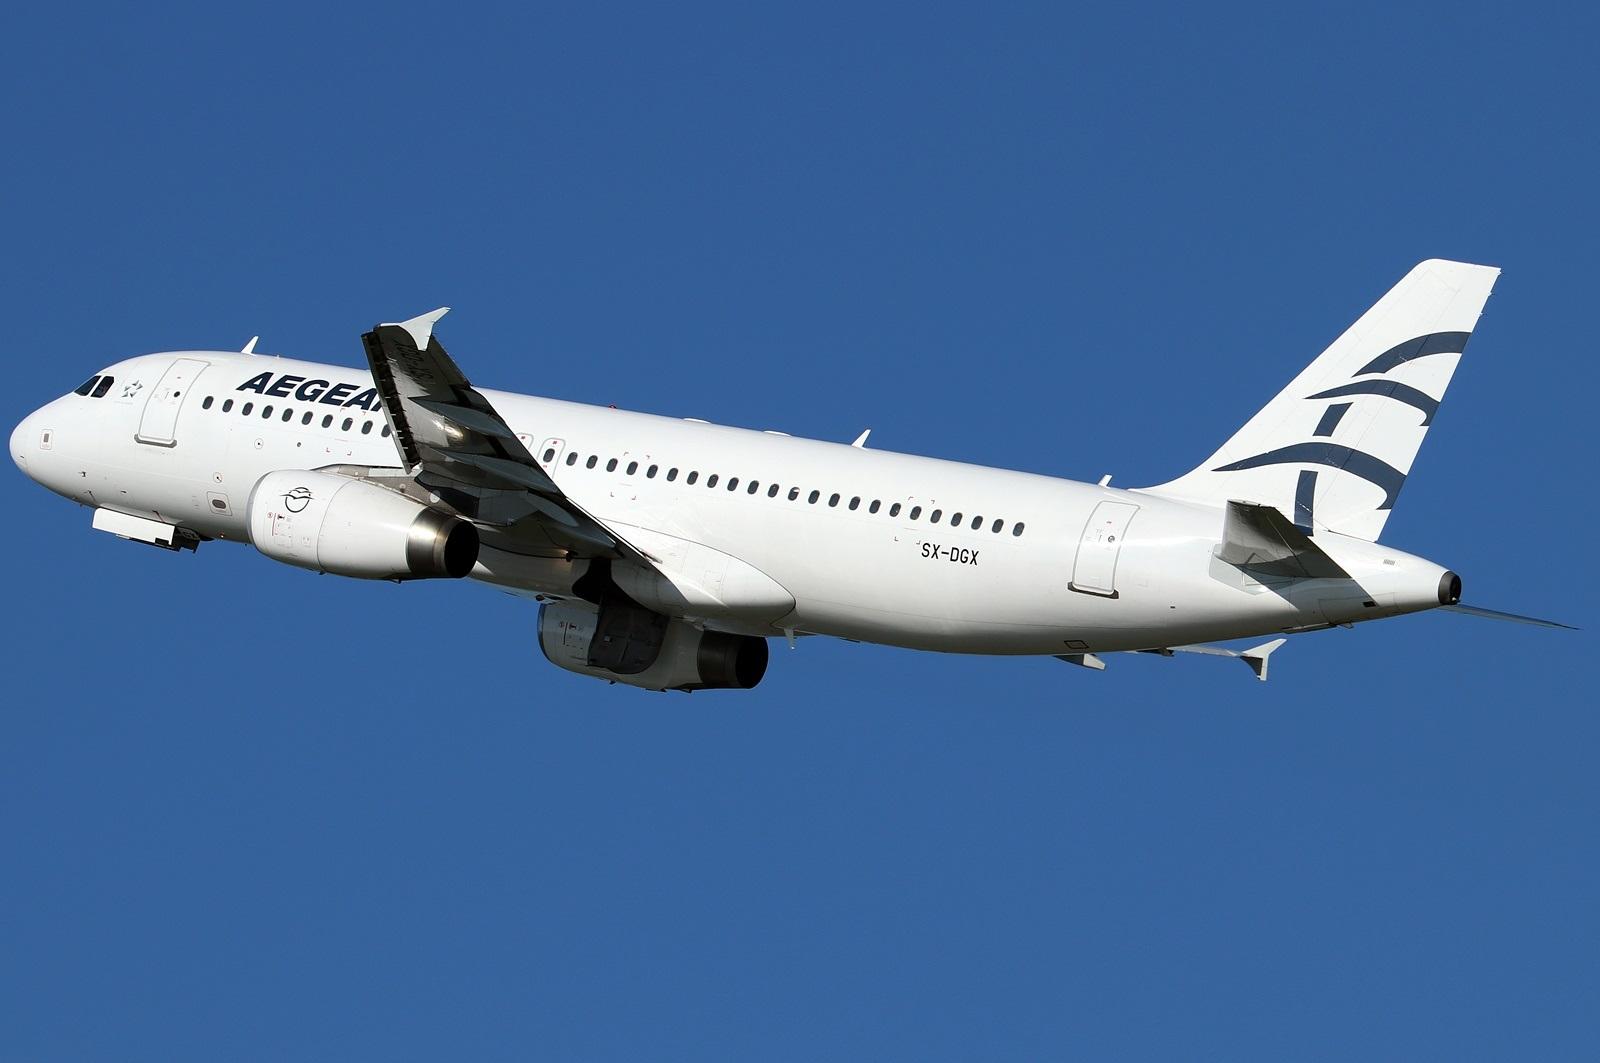 Airbus A320 поворачивает после взлета